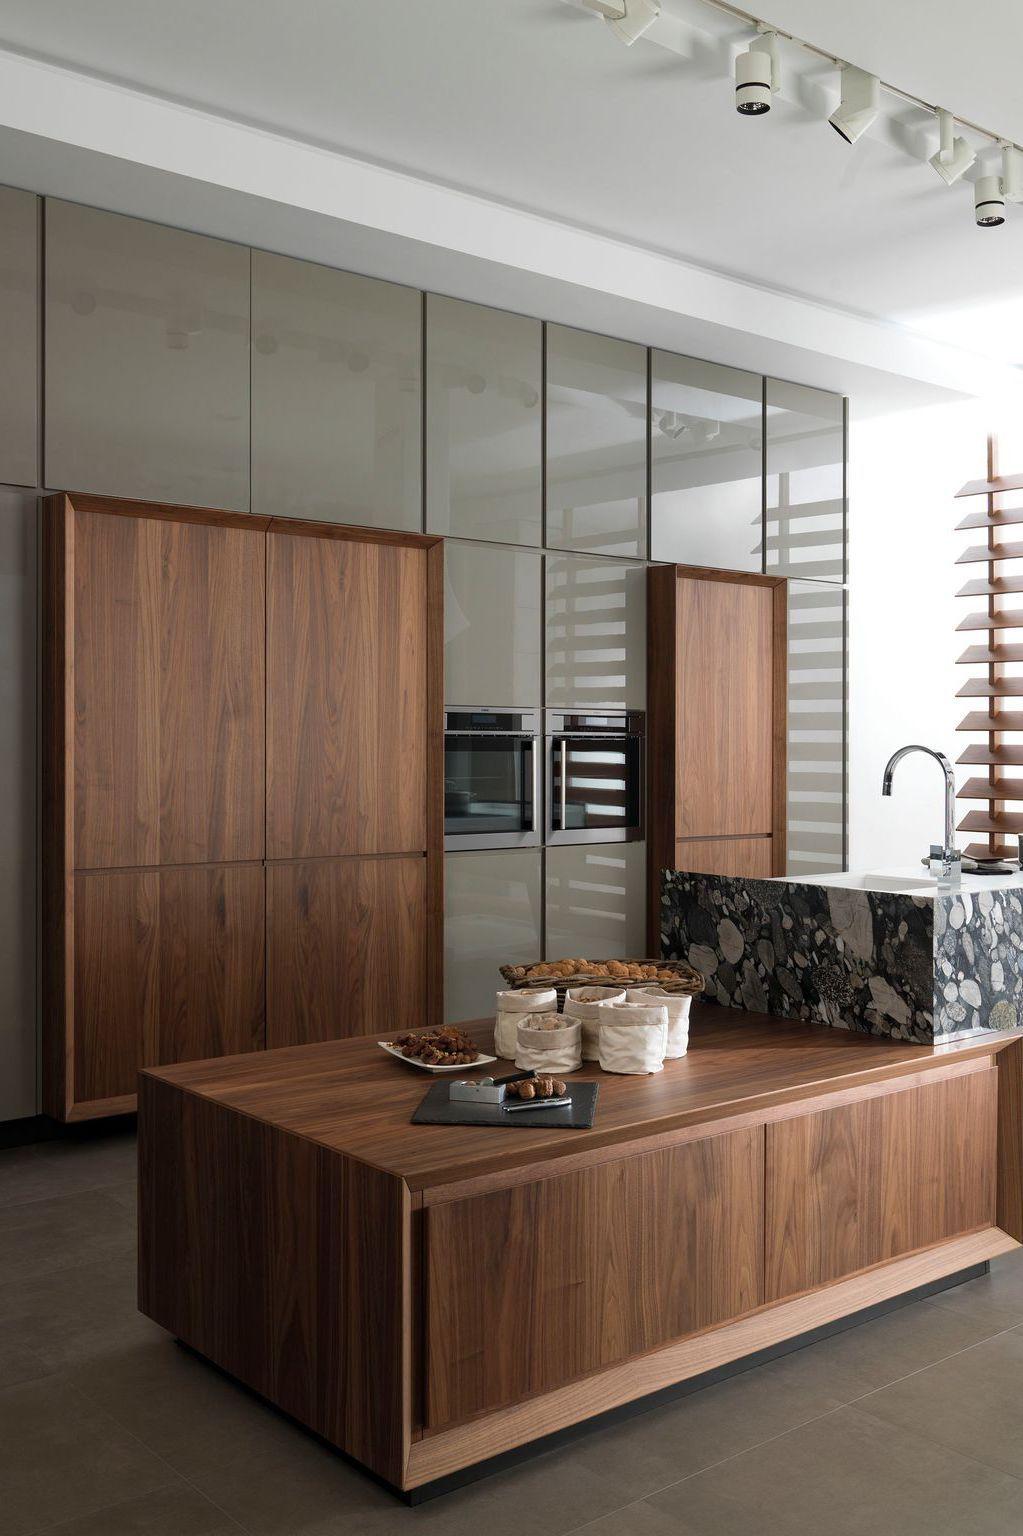 B&q Kitchens Home Depot Cuisine Contemporaine Moderne Chic Urbaine 厨房 Pinterest Une Elegante